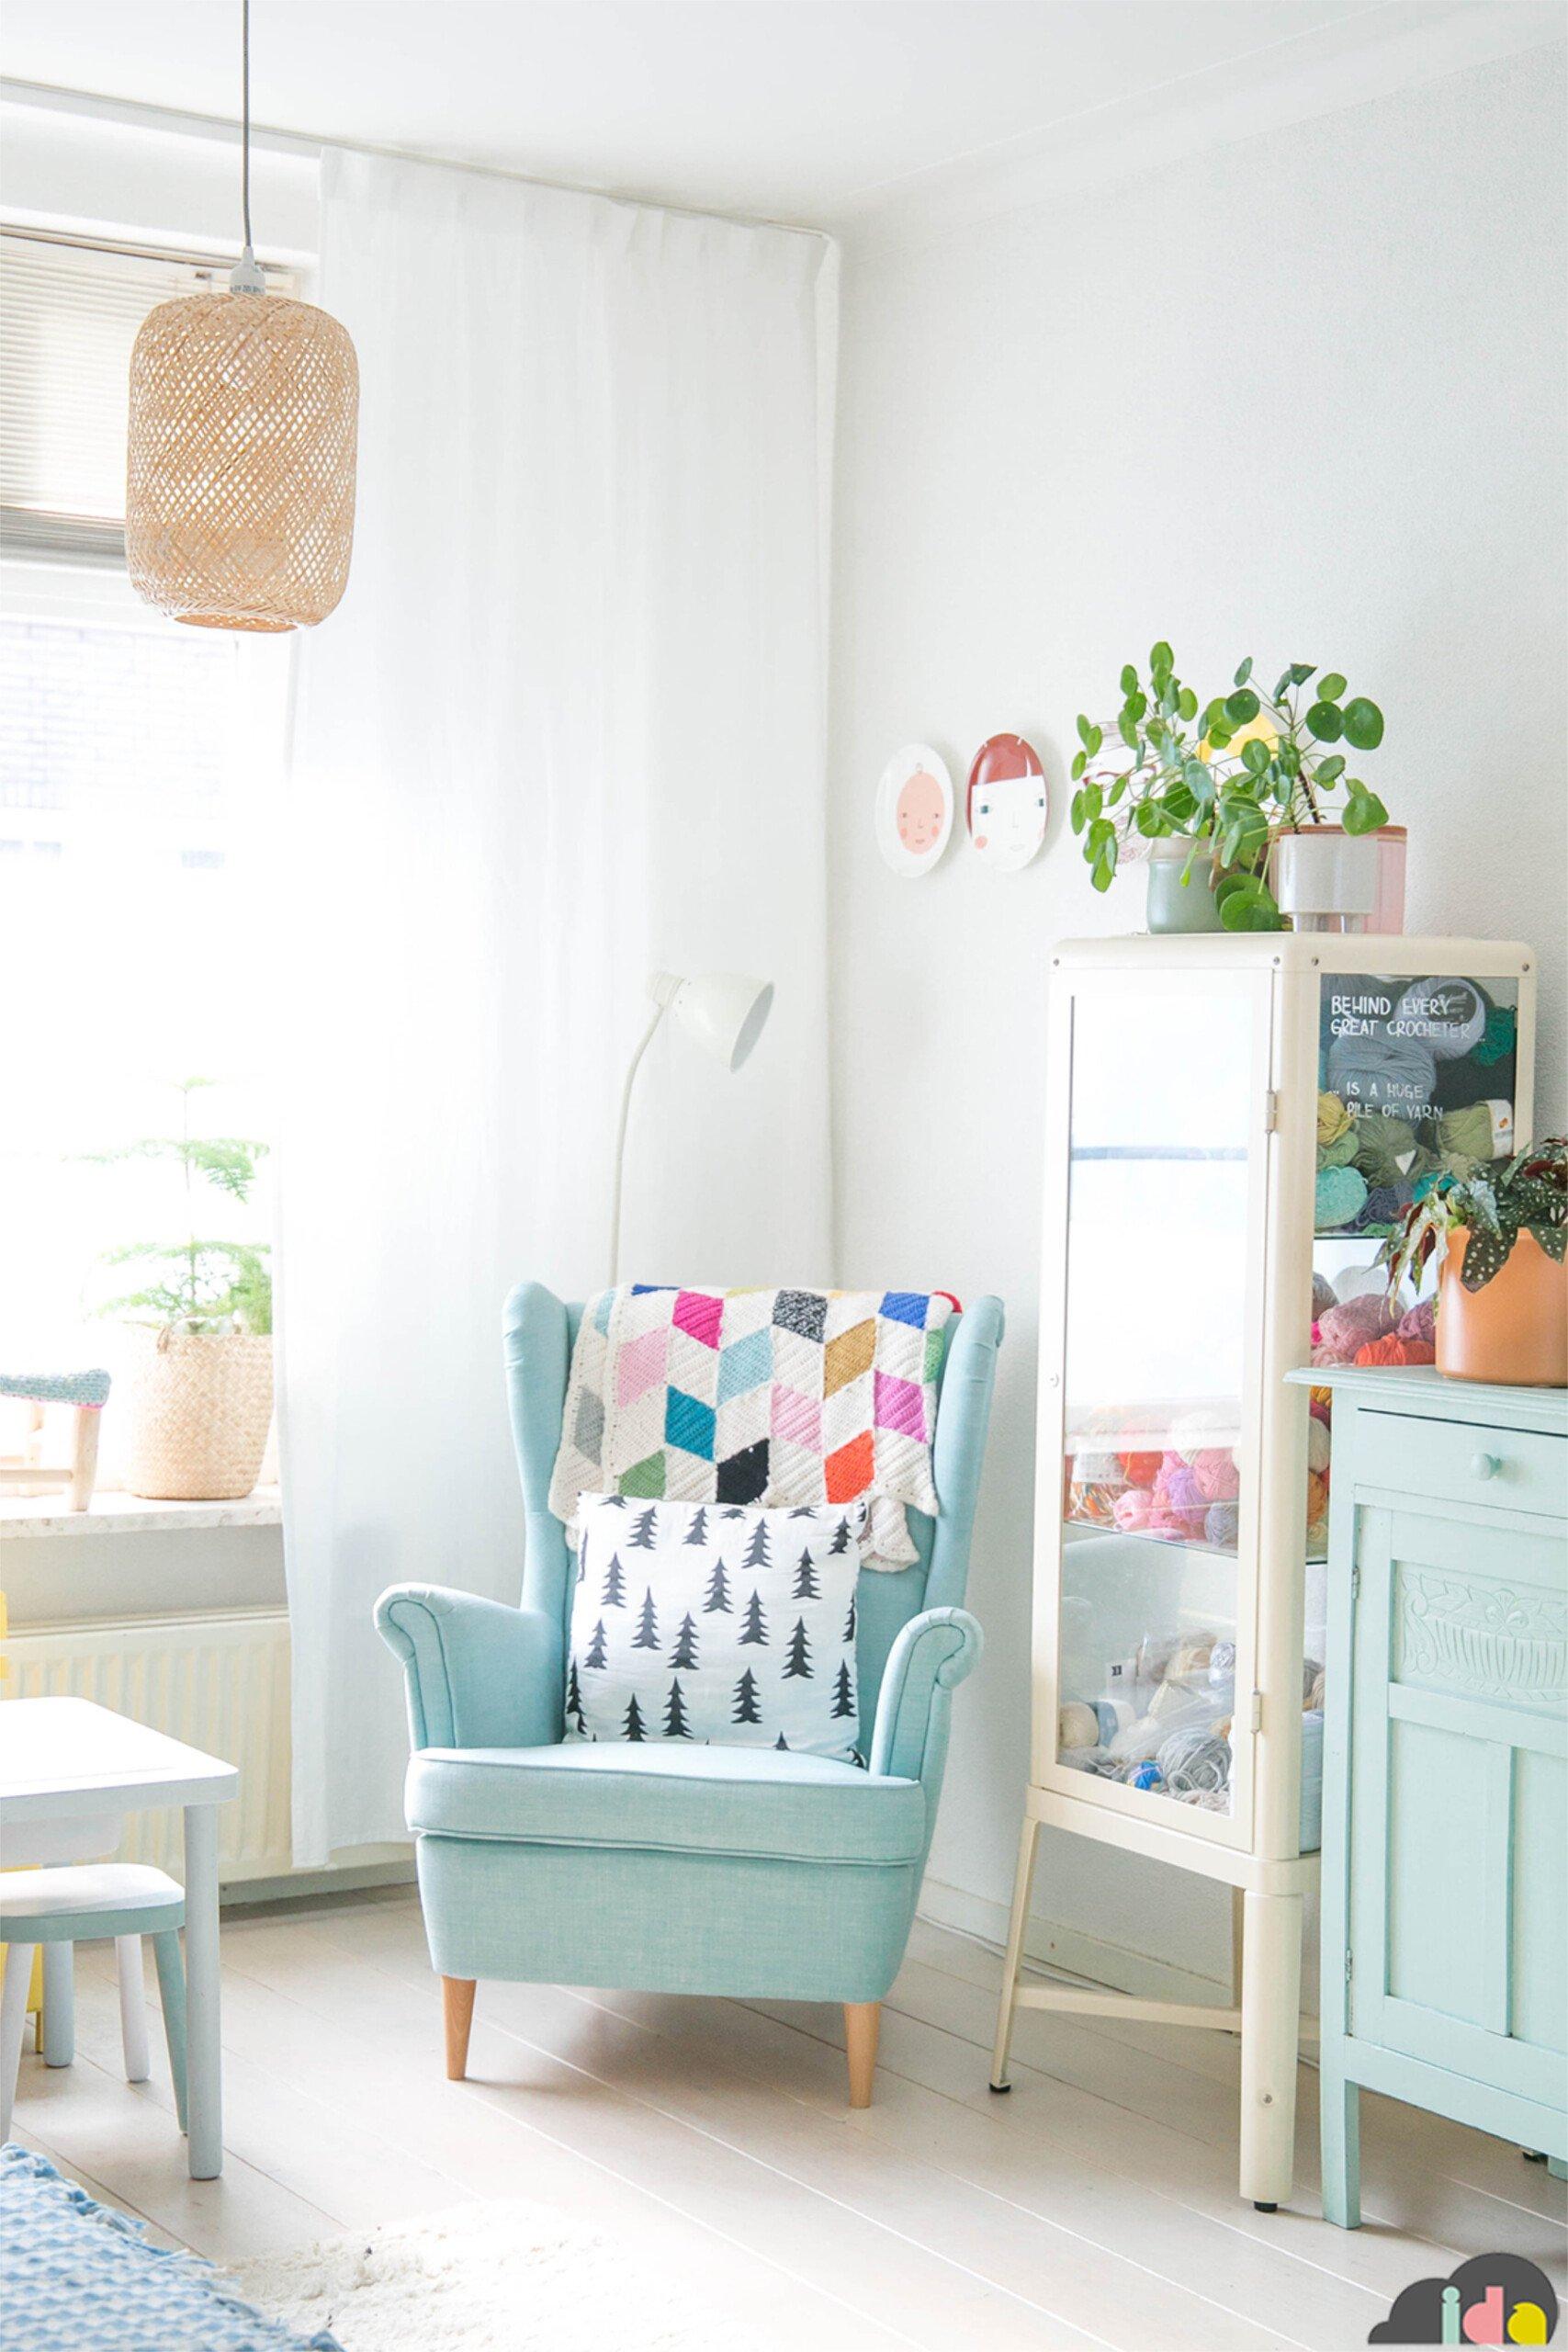 IDAinteriorlifestyle 2 livingroom chair cozy home scaled